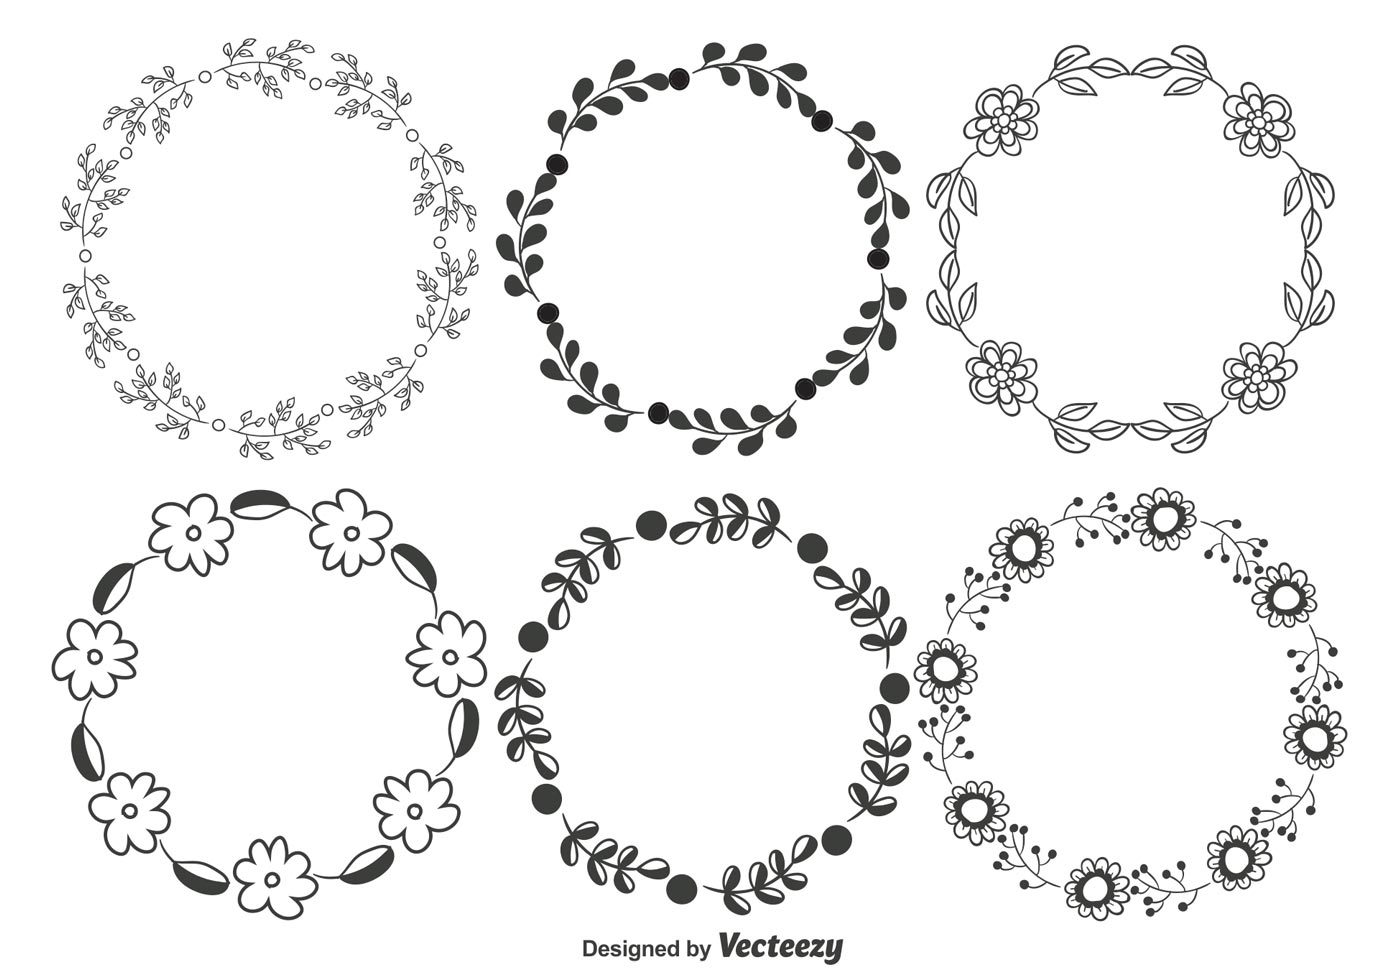 Decorative Floral Frame Set - Download Free Vector Art, Stock ...